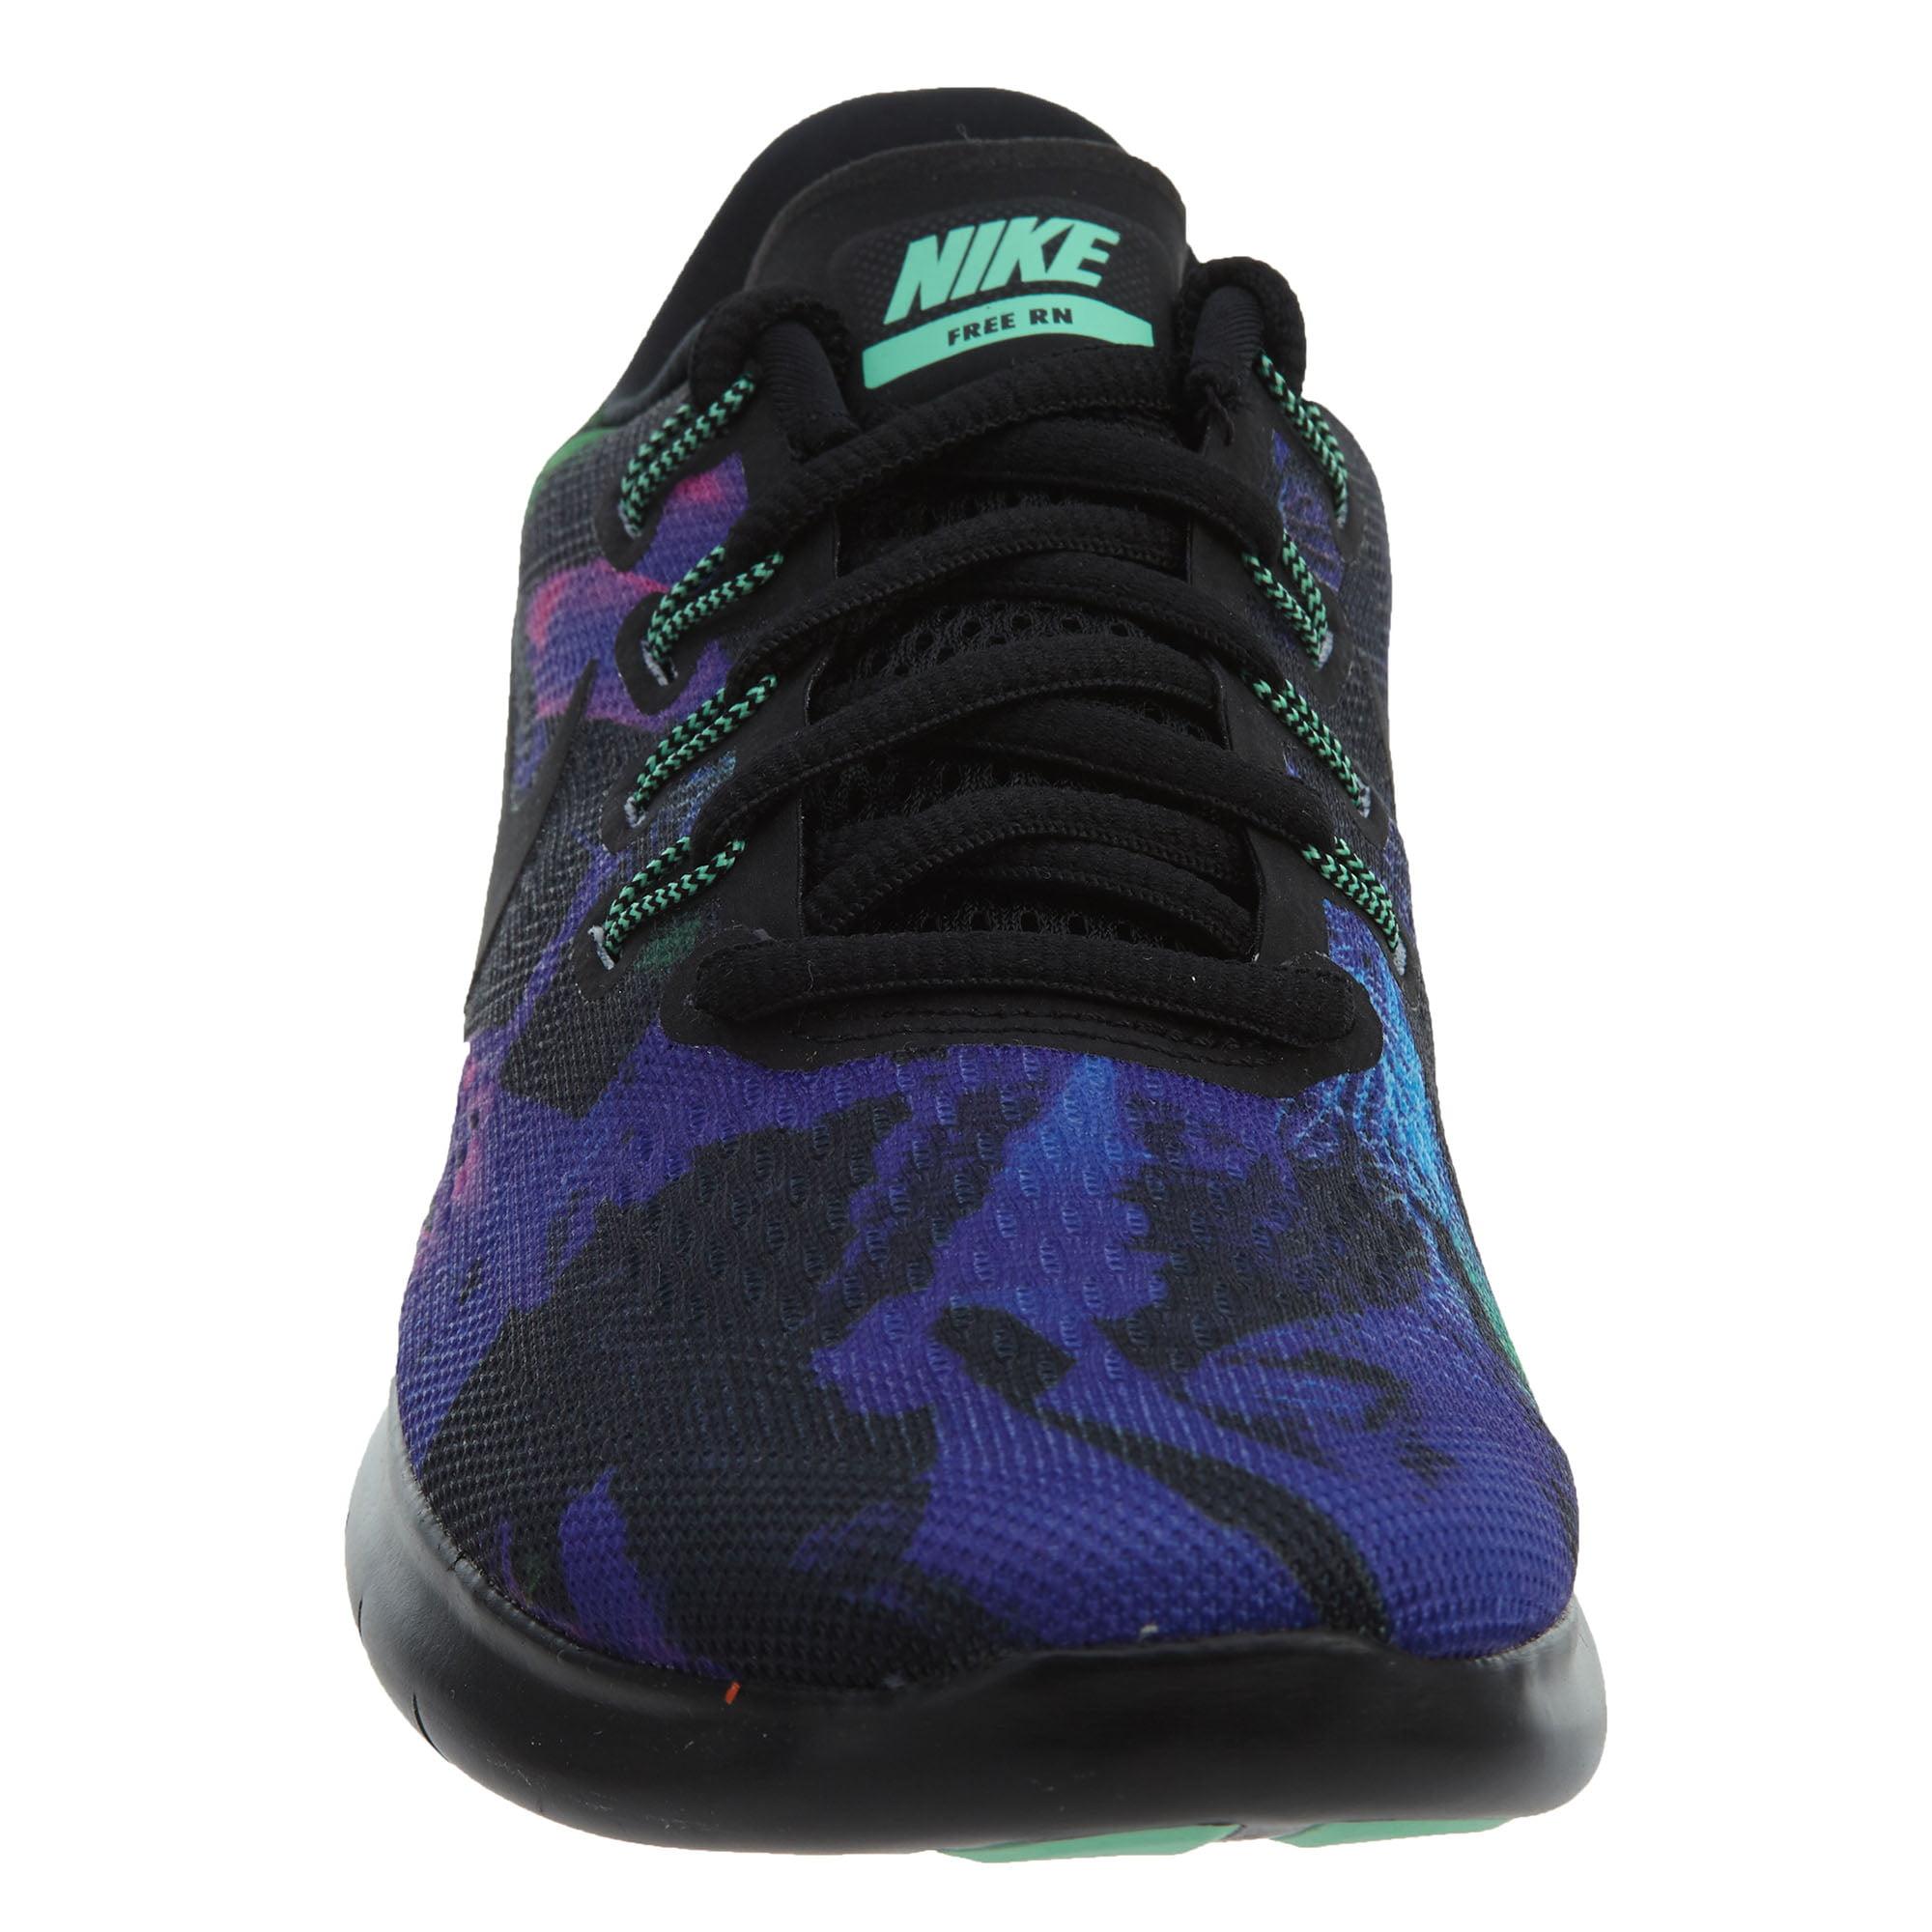 Más Mierda Rebobinar  Nike - Nike Women's Free RN 2017 Solstice Running Shoes (Black/Green, 8.0)  - Walmart.com - Walmart.com